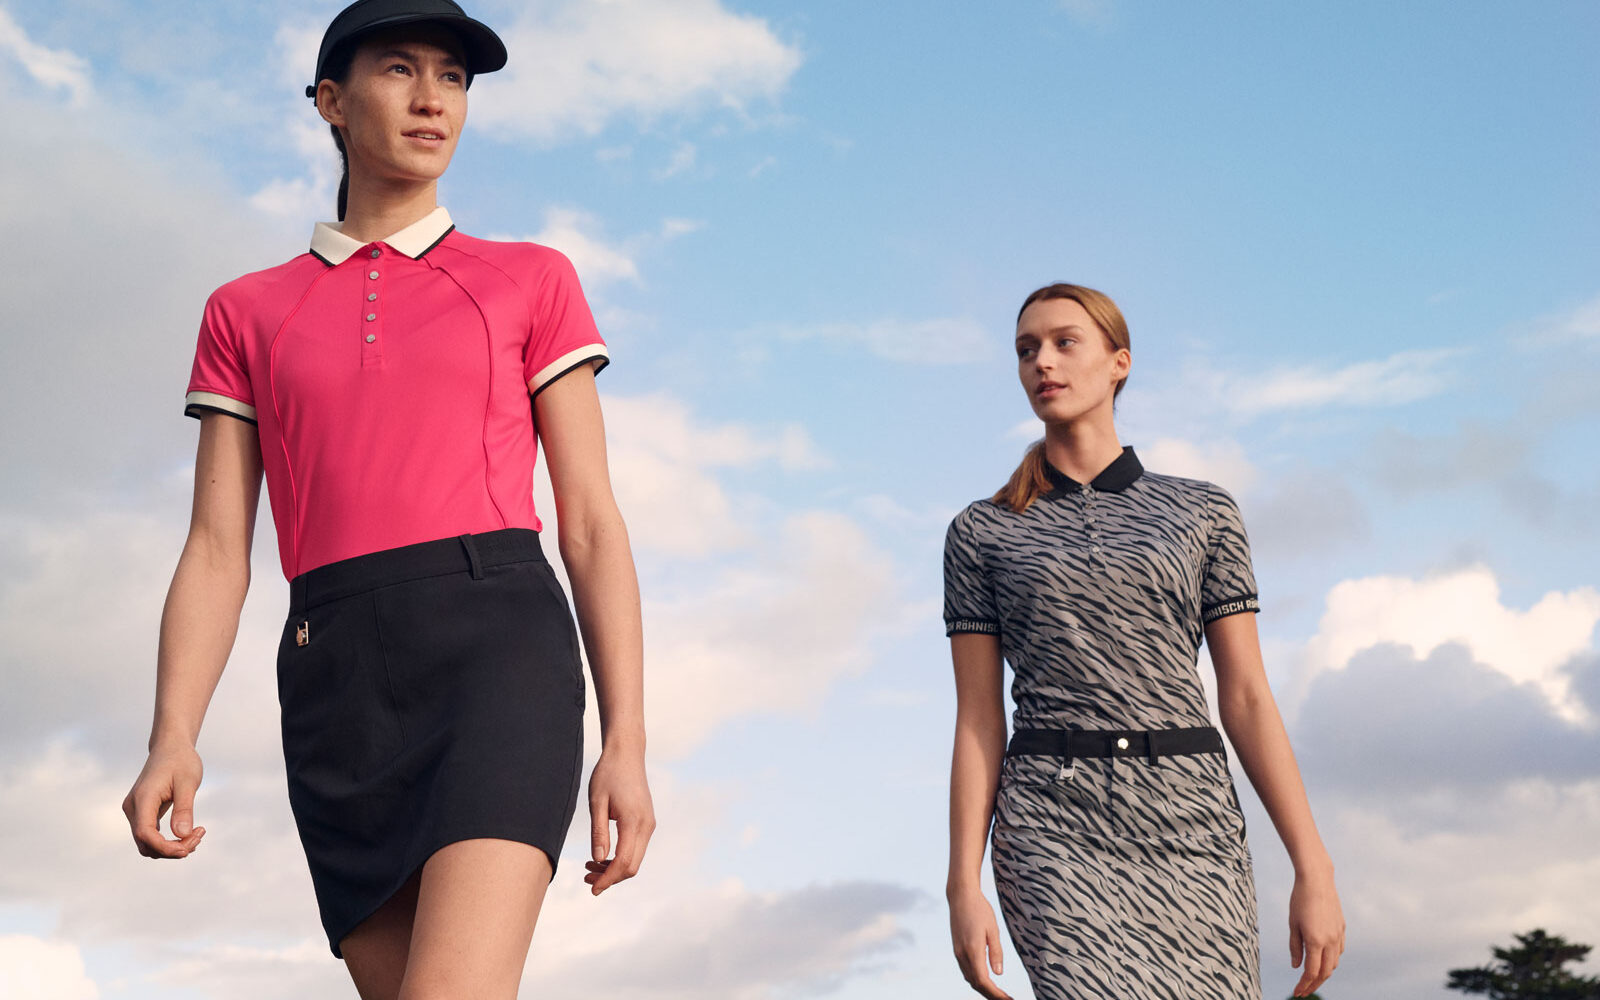 Rohnisch Sportswear Fall and Winter 20202 Golf 17